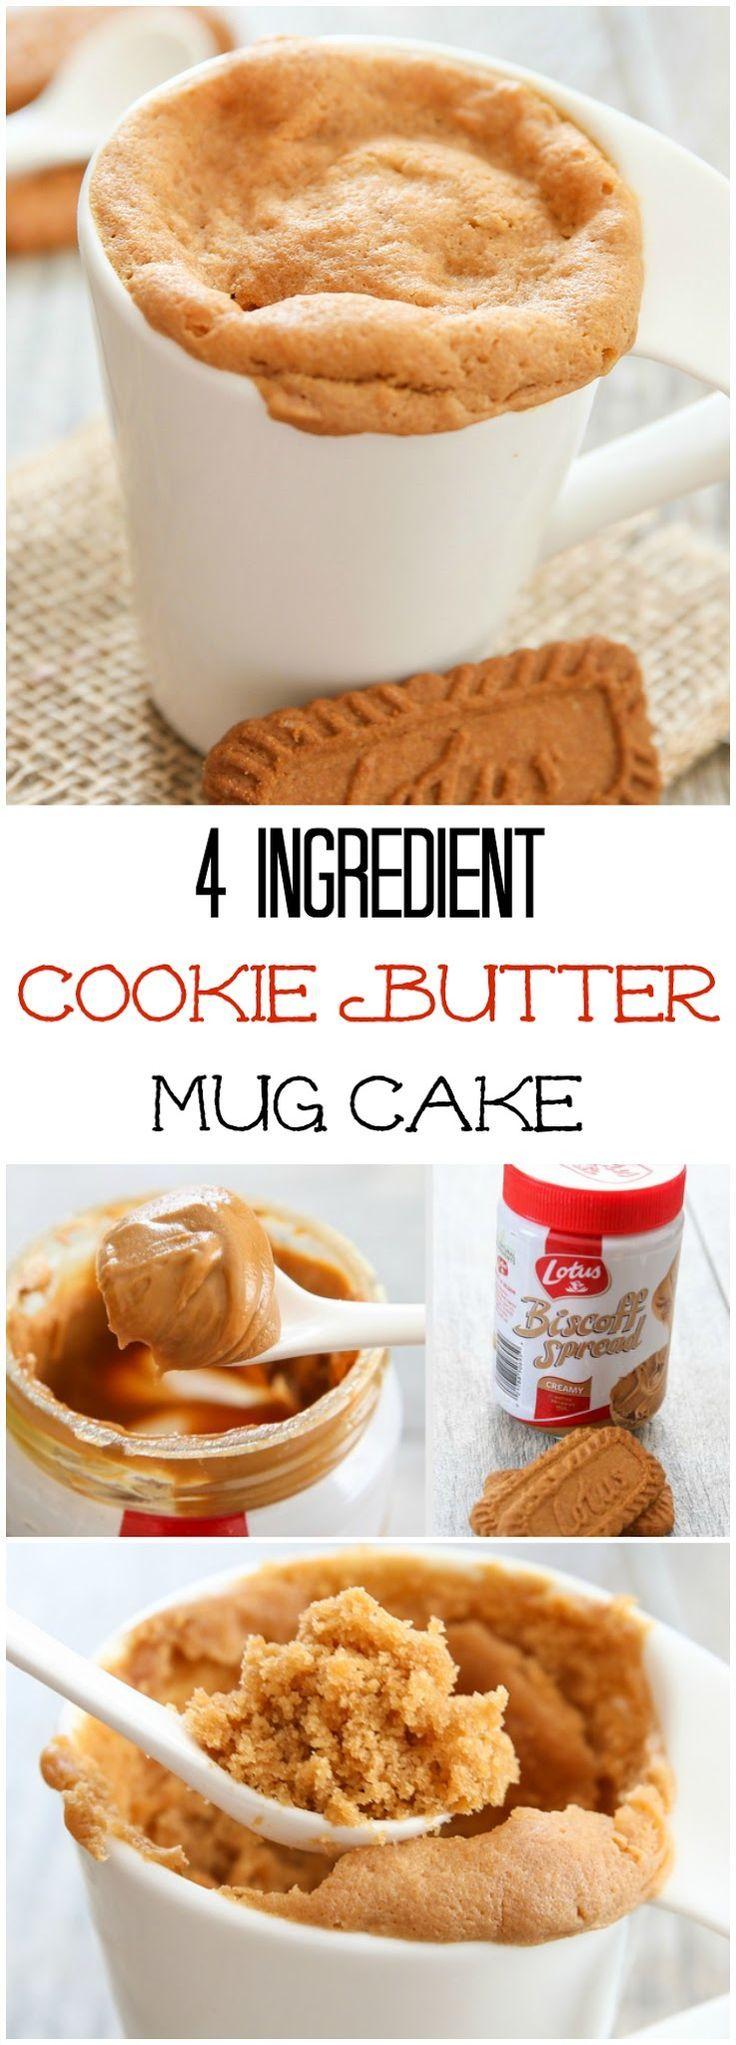 Cookie Butter Mug Cake | Recipe | Mug recipes, Desserts ...